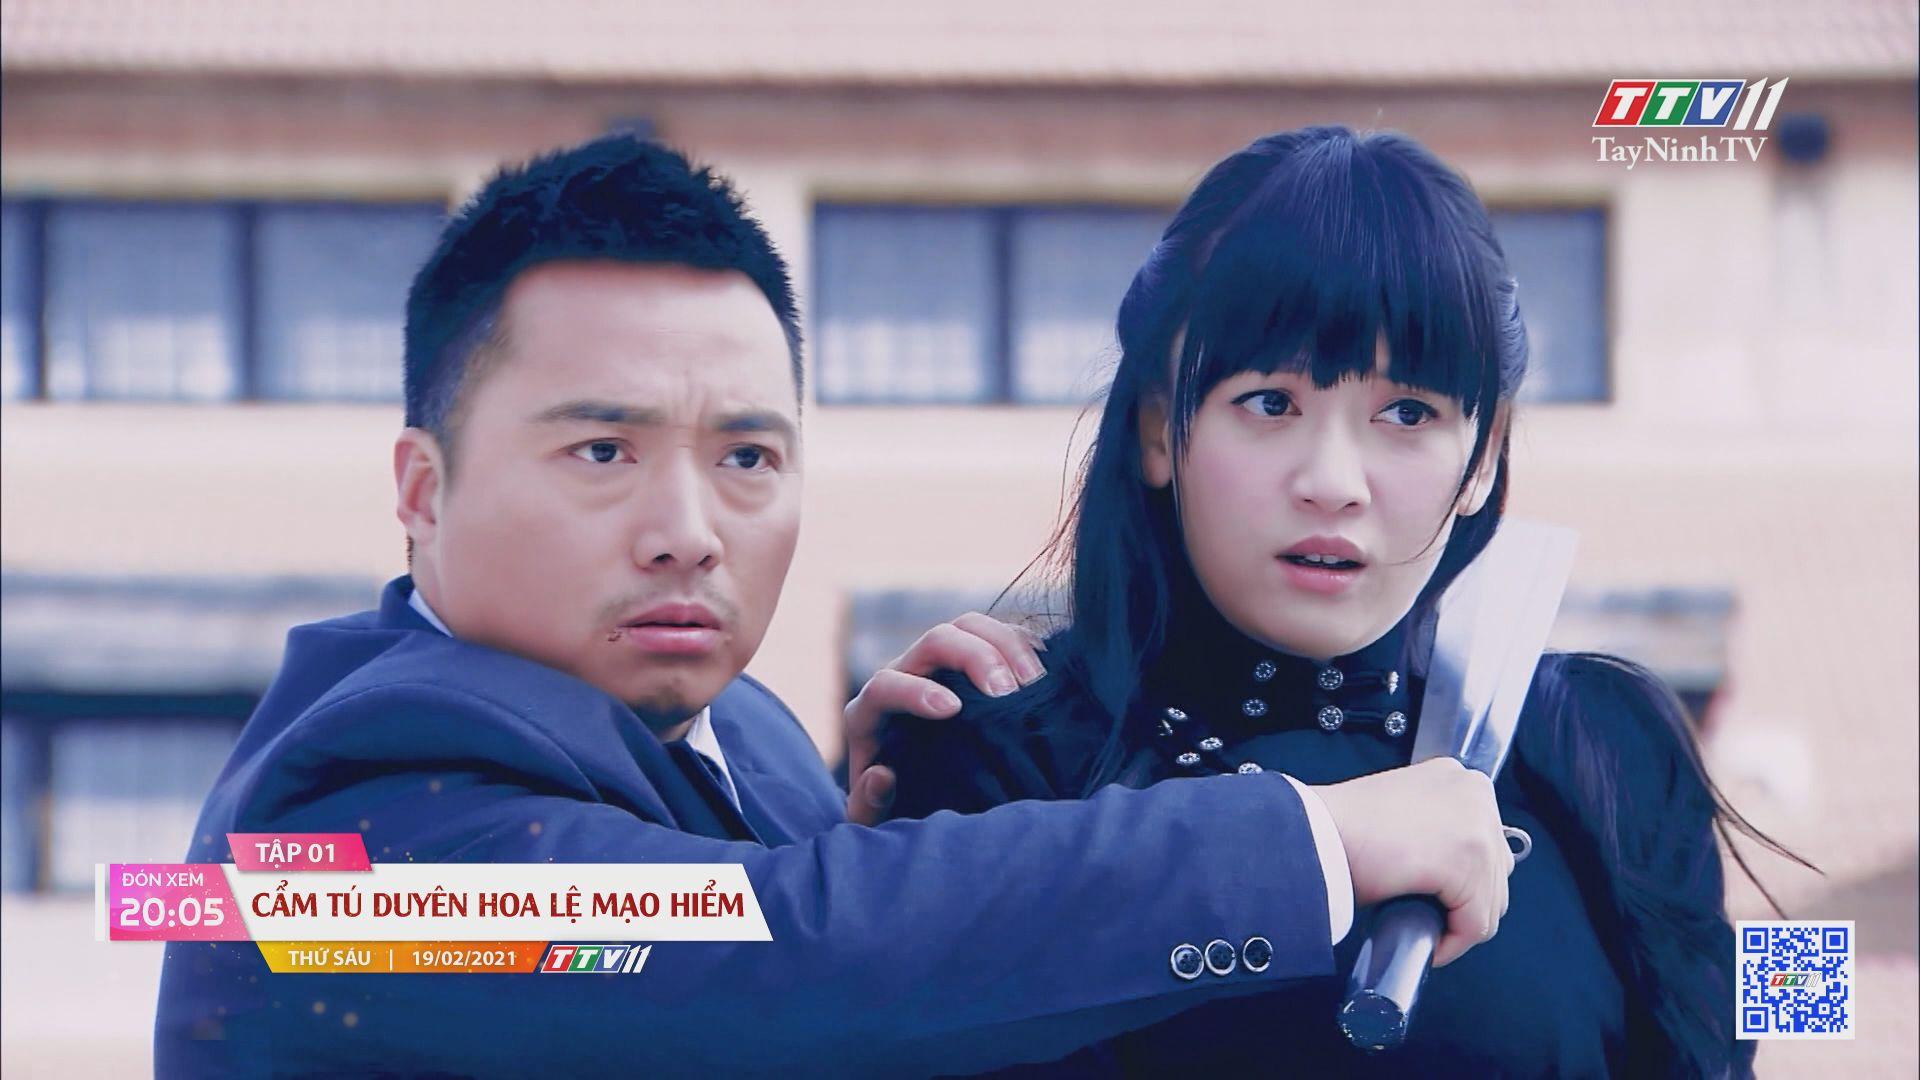 Cẩm Tú duyên hoa lệ mạo hiểm-Trailer tập 1 | PHIM CẨM TÚ DUYÊN HOA LỆ MẠO HIỂM | TayNinhTVE